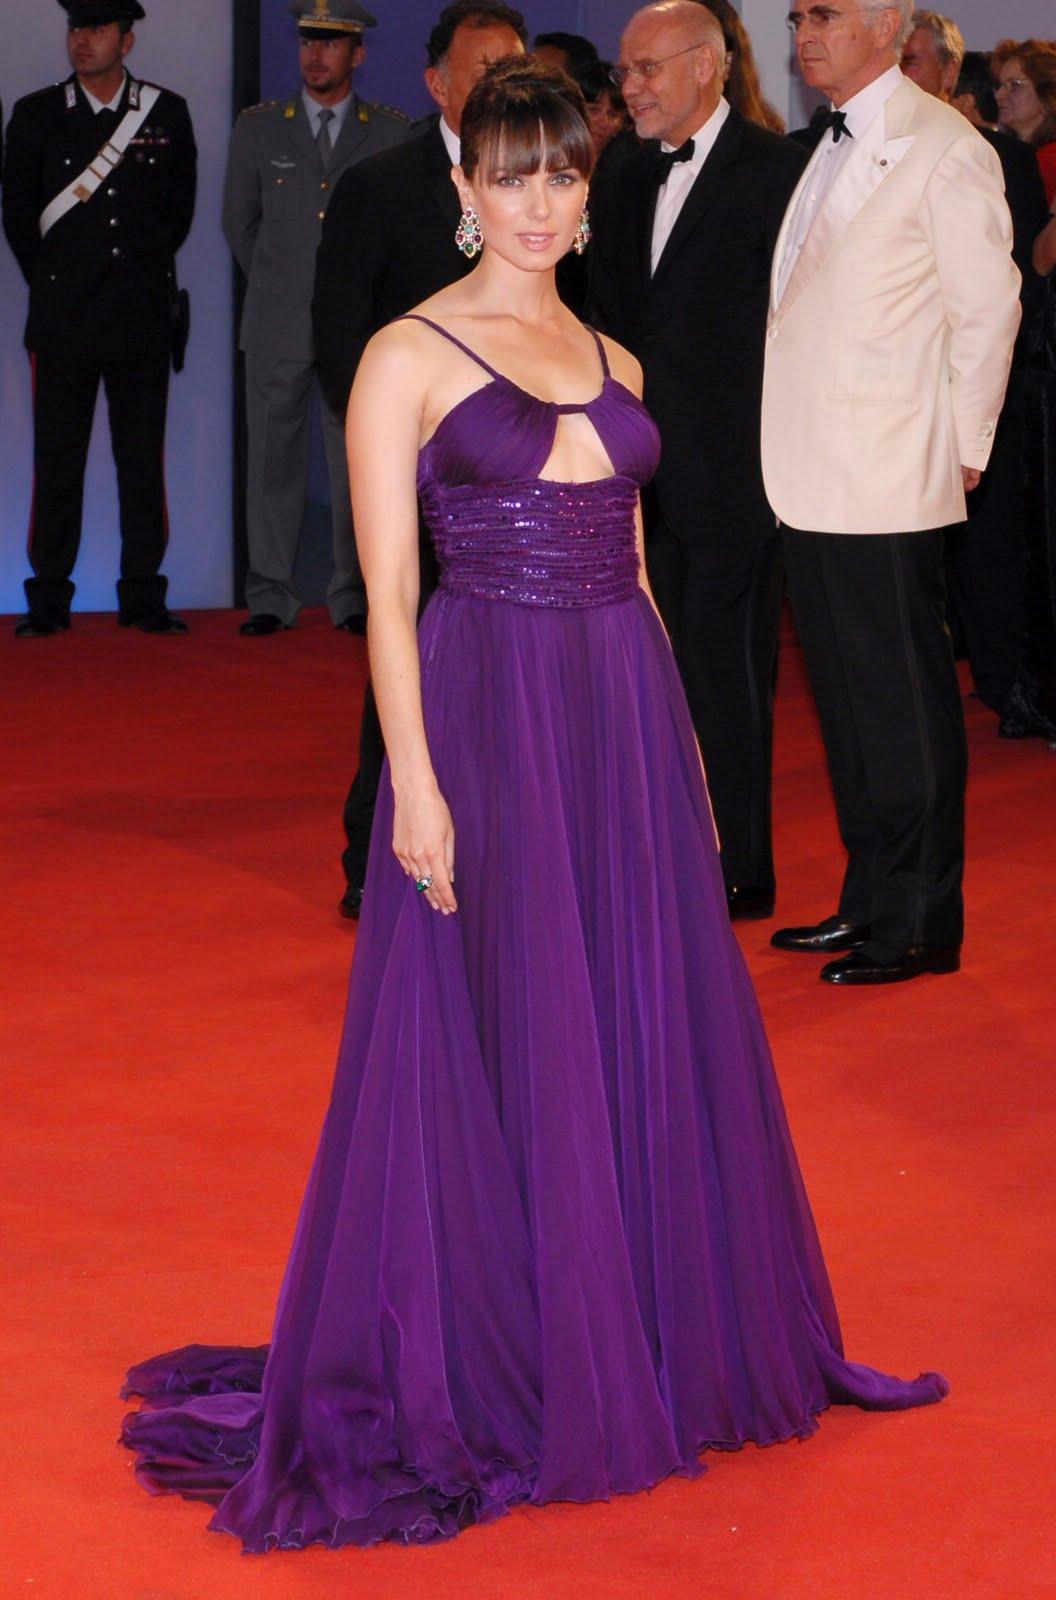 Fashion Mia Online Customer Reviews: Celebrities And Fashion: Mia Kirshner Fashion